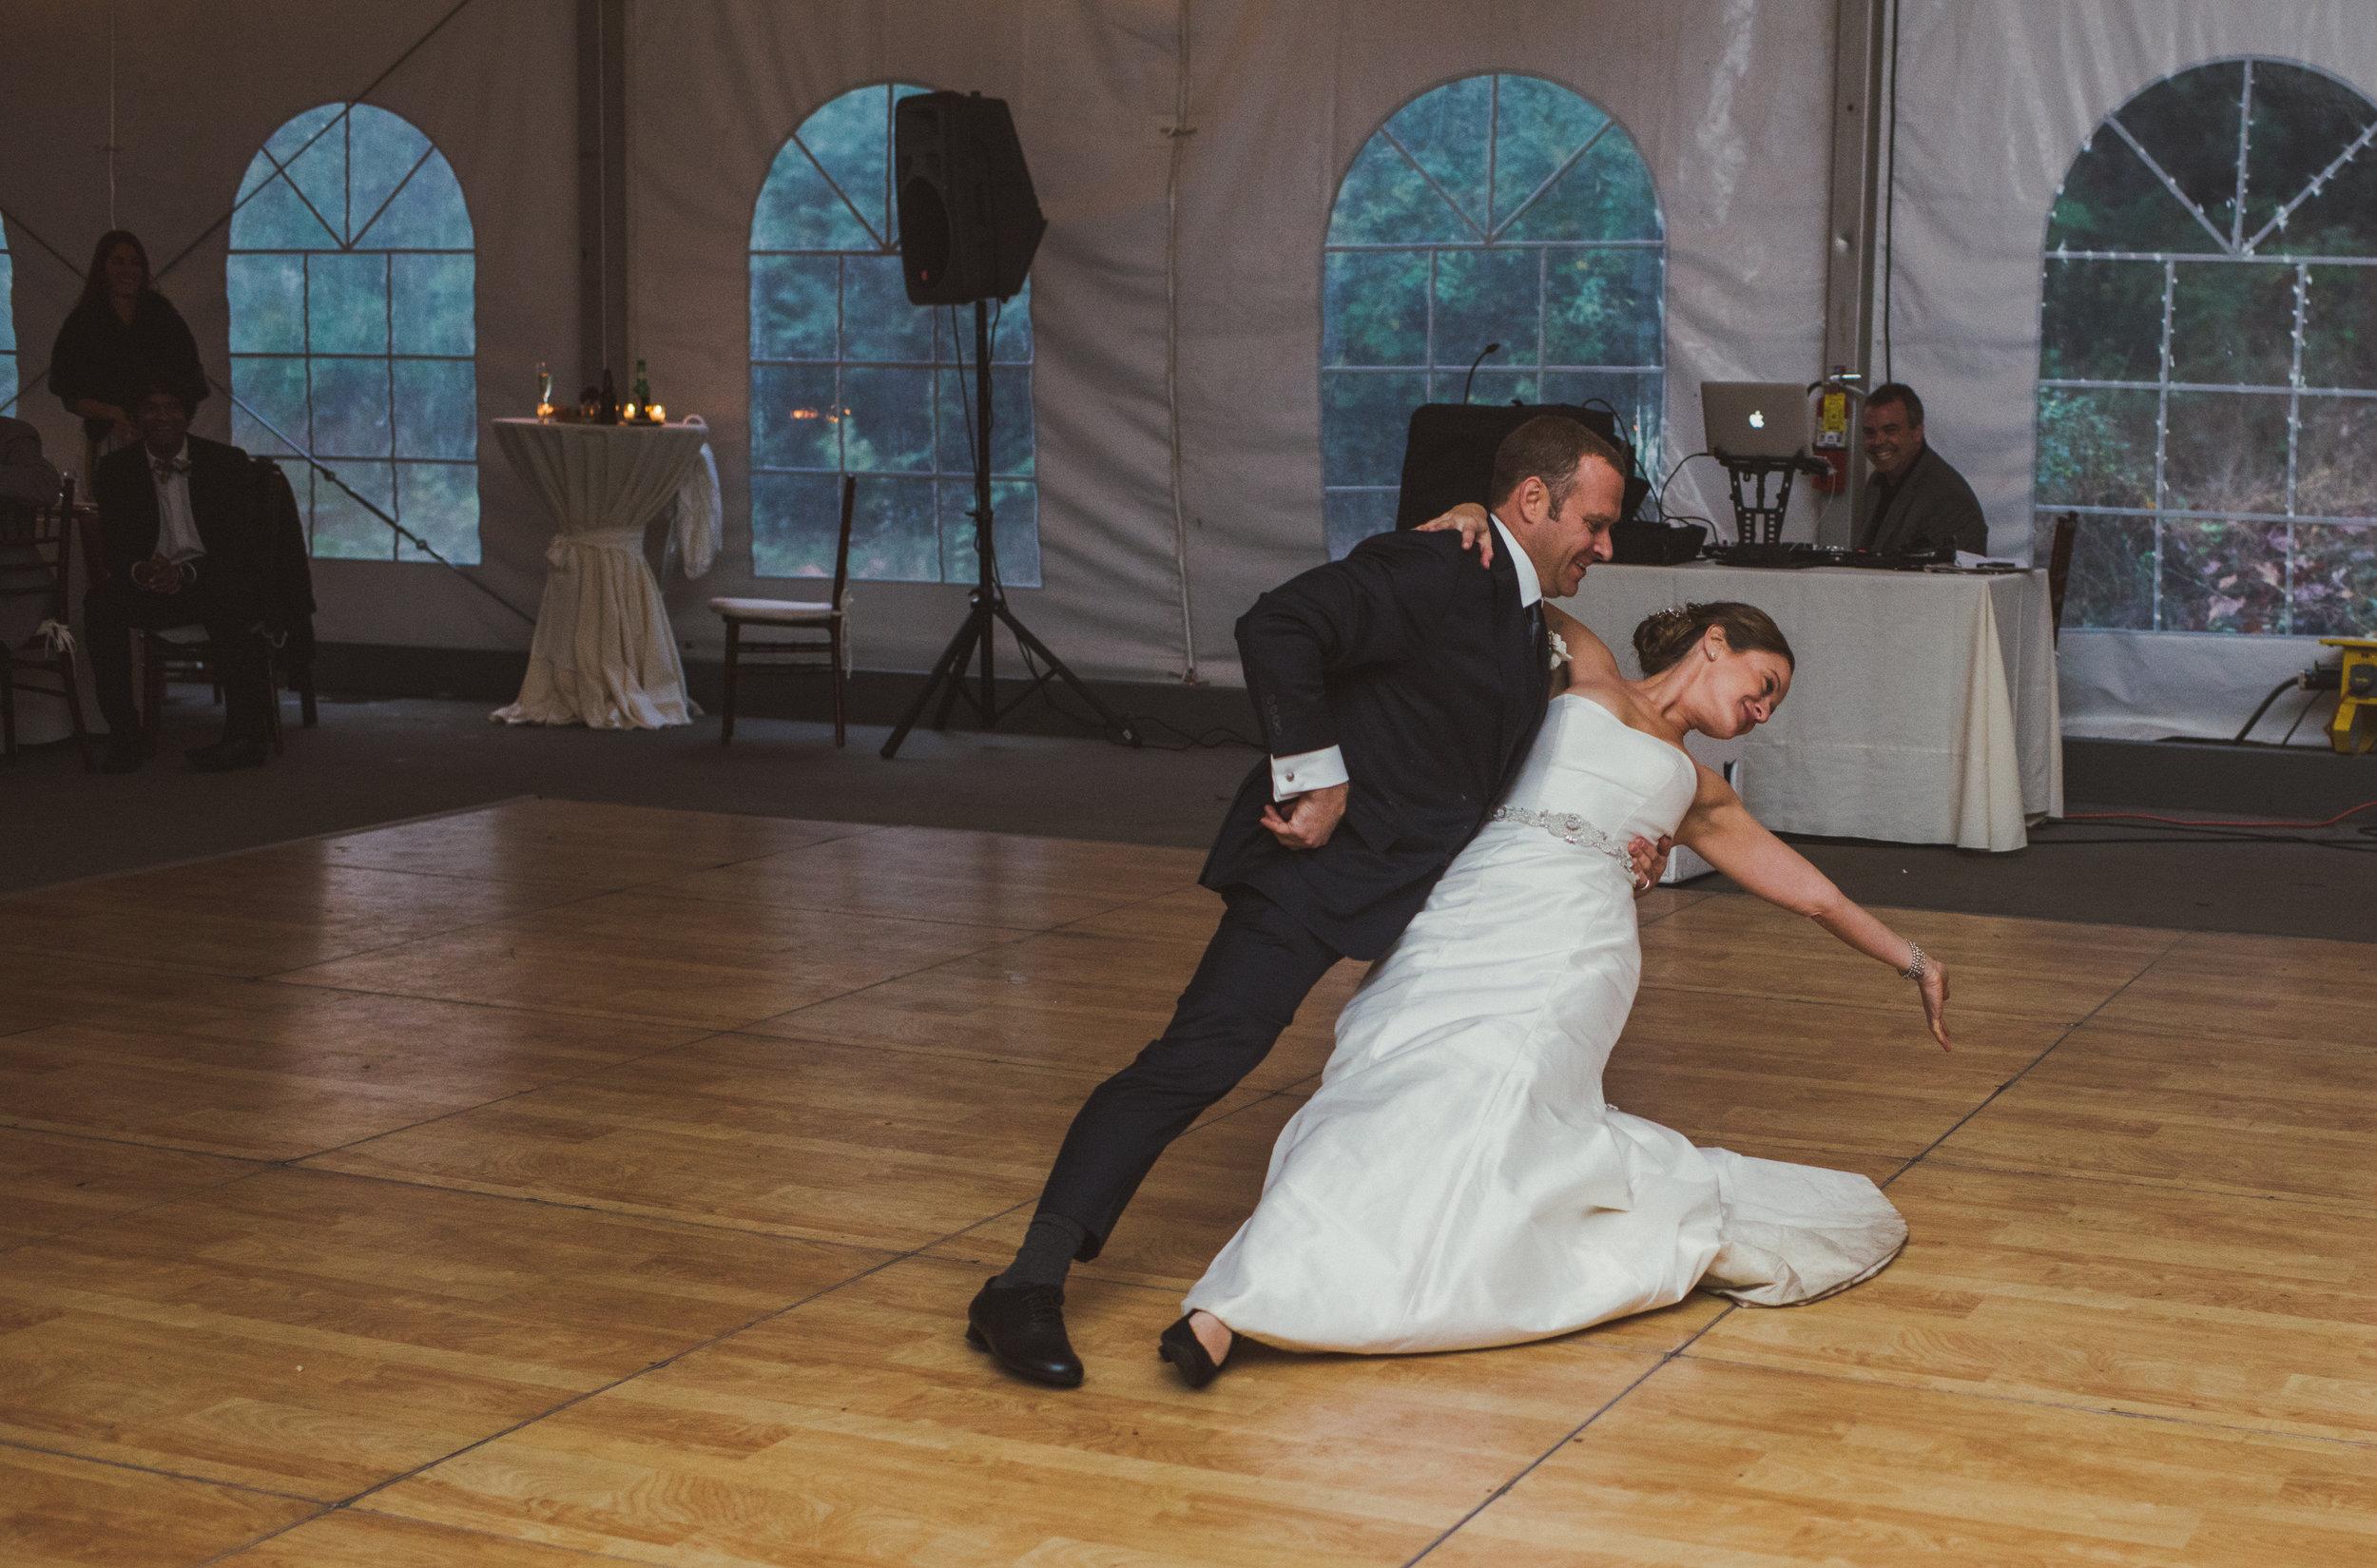 JACQUELINE & ANDREW WARSHAWER -BROOKMILL FARM FALL WEDDING - INTIMATE WEDDING PHOTOGRAPHER - TWOTWENTY by CHI-CHI AGBIM-482.jpg